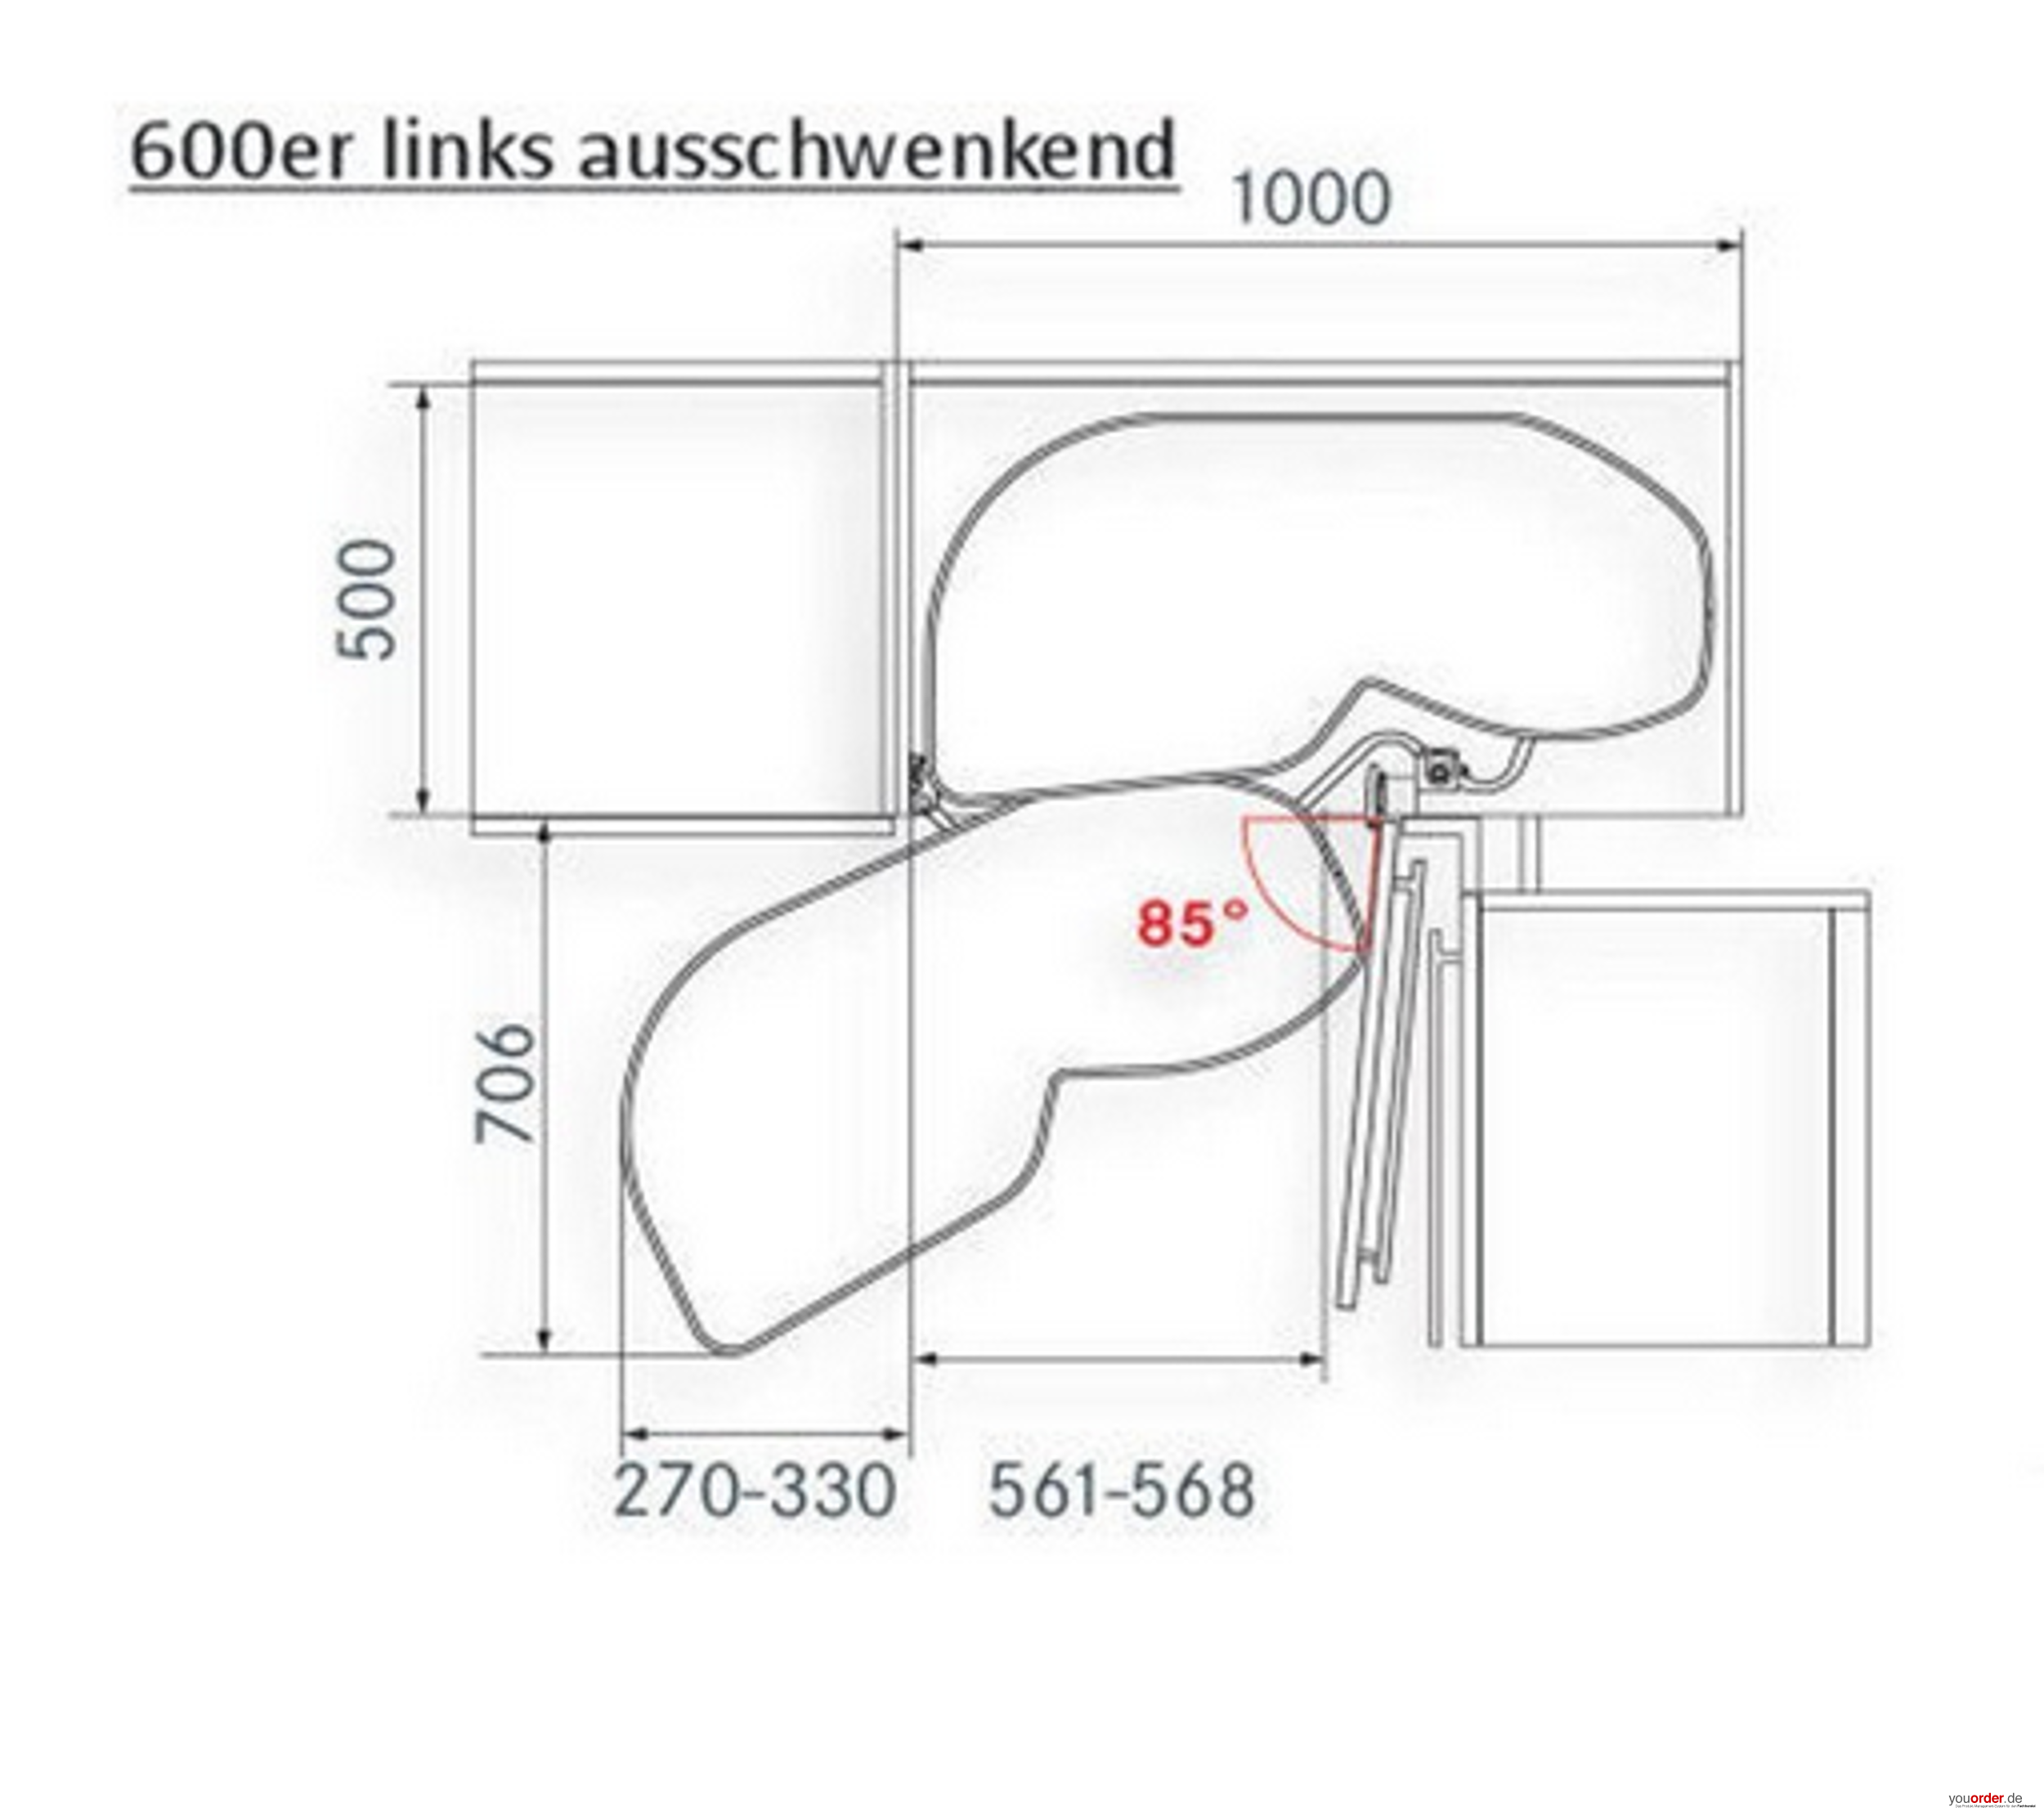 Le Mans Eckschrank kesseböhmer lemans eckschrank schwenkauszug 60er türbreite